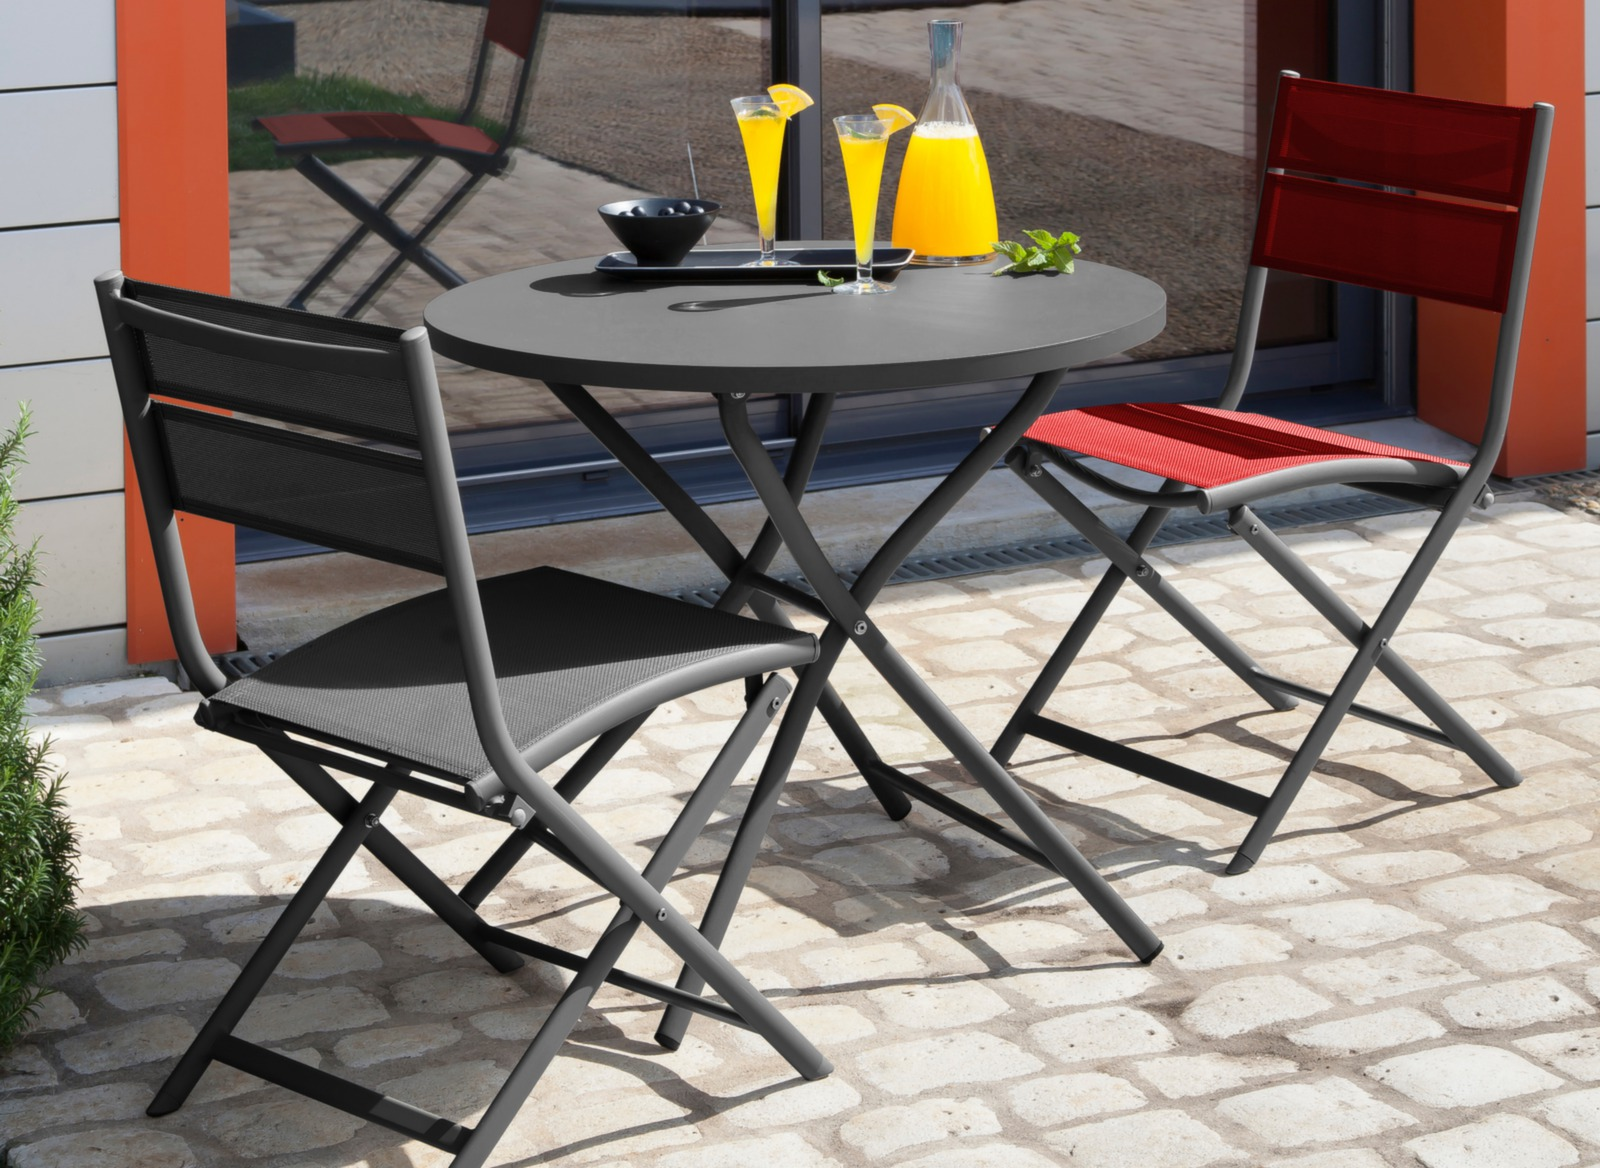 chaise de jardin pliante orange et grise win oc o proloisirs. Black Bedroom Furniture Sets. Home Design Ideas